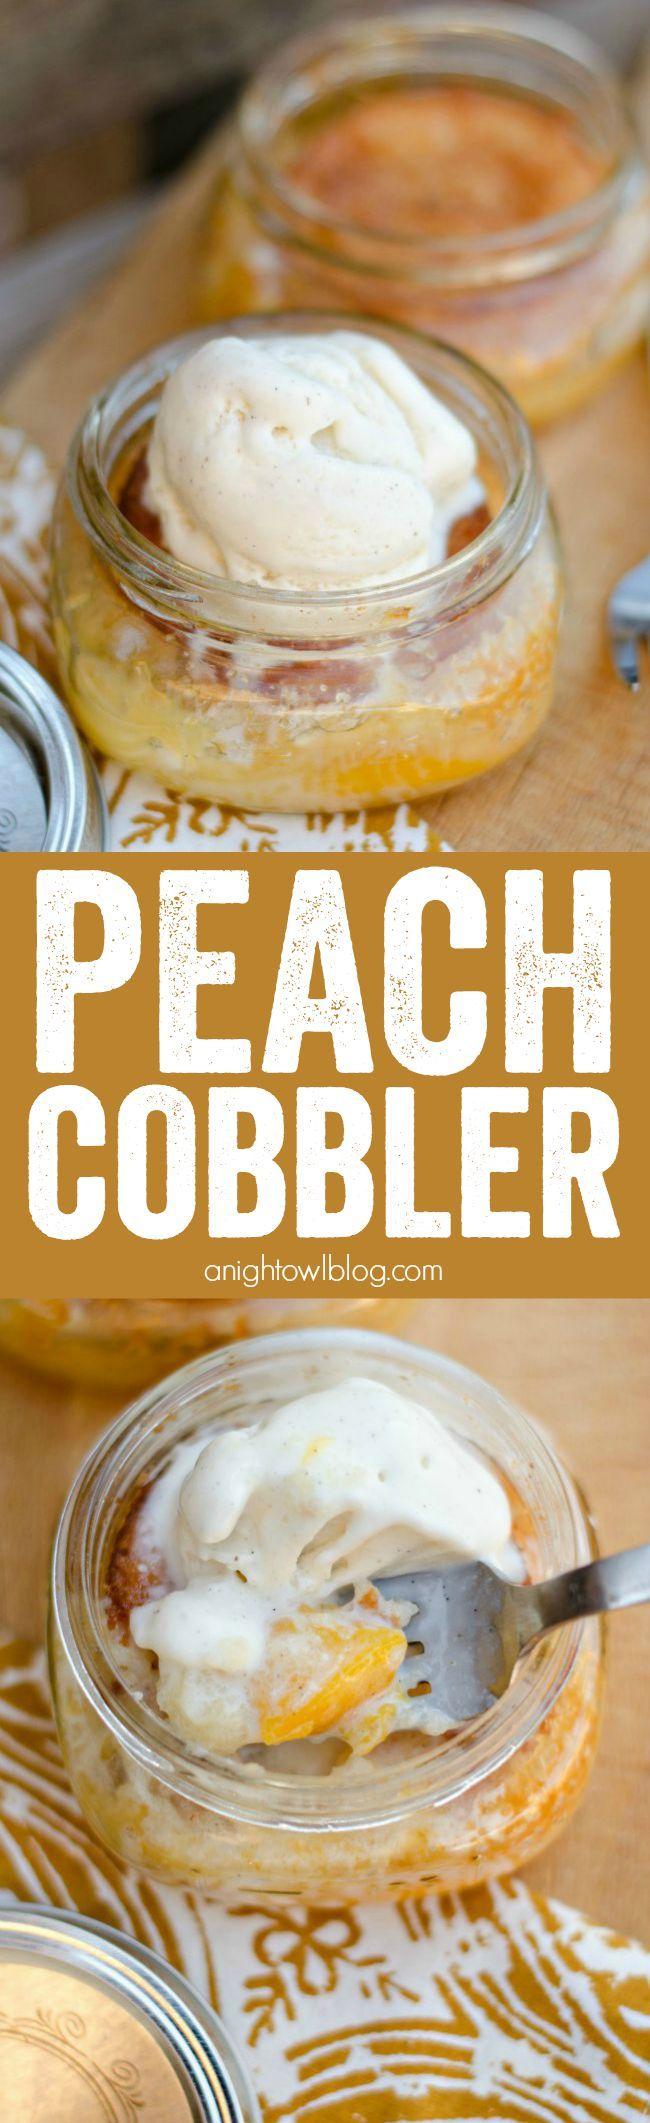 Easy Peach Cobbler in a Jar #peachcobblercheesecake